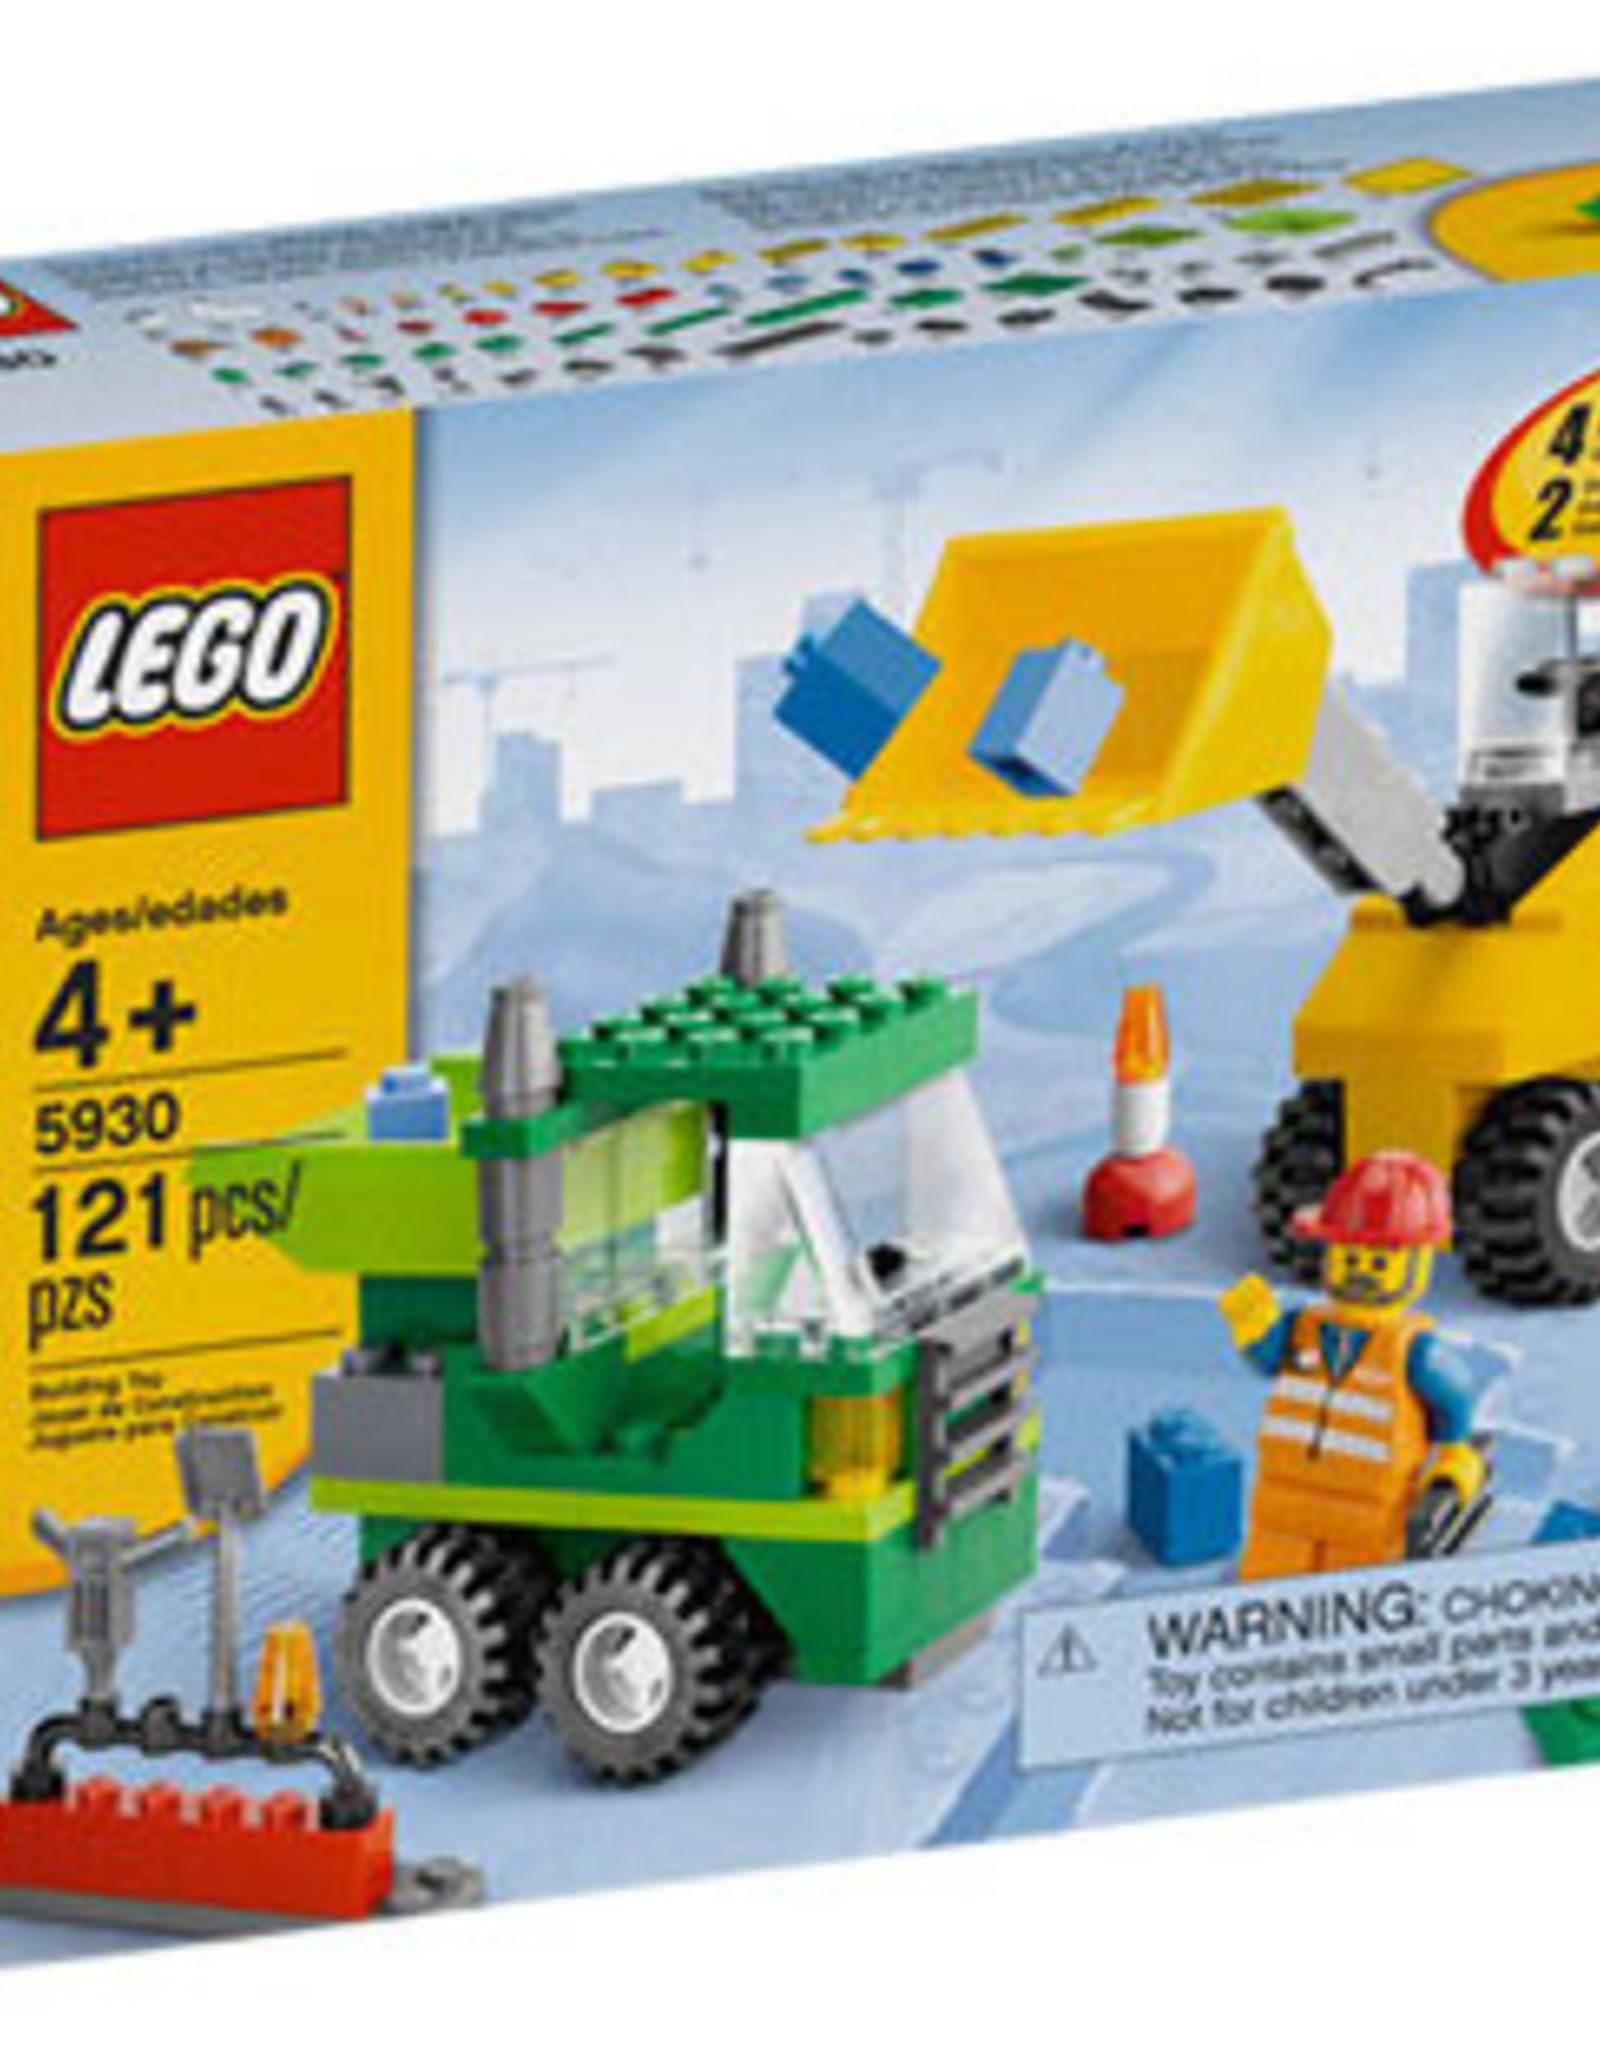 LEGO LEGO 5930 Construction Building Site CREATOR